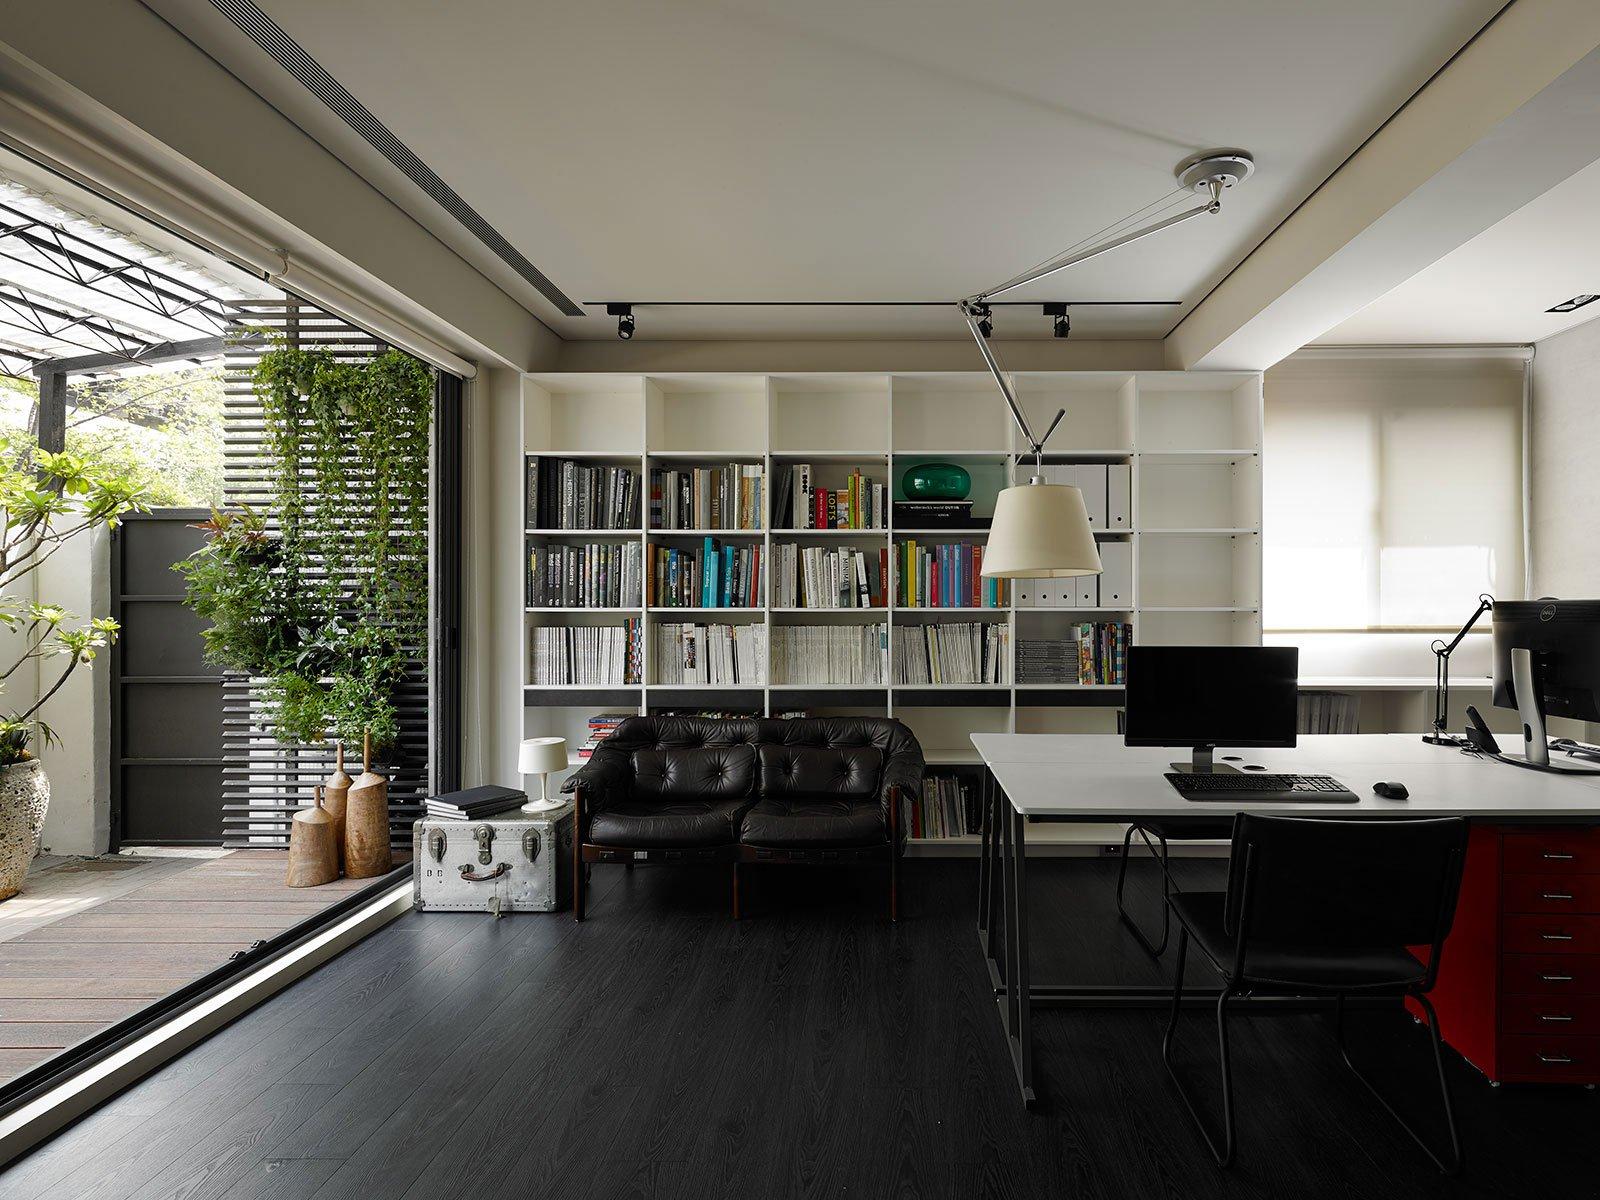 Awork design studio by awork design caandesign for Office design studio